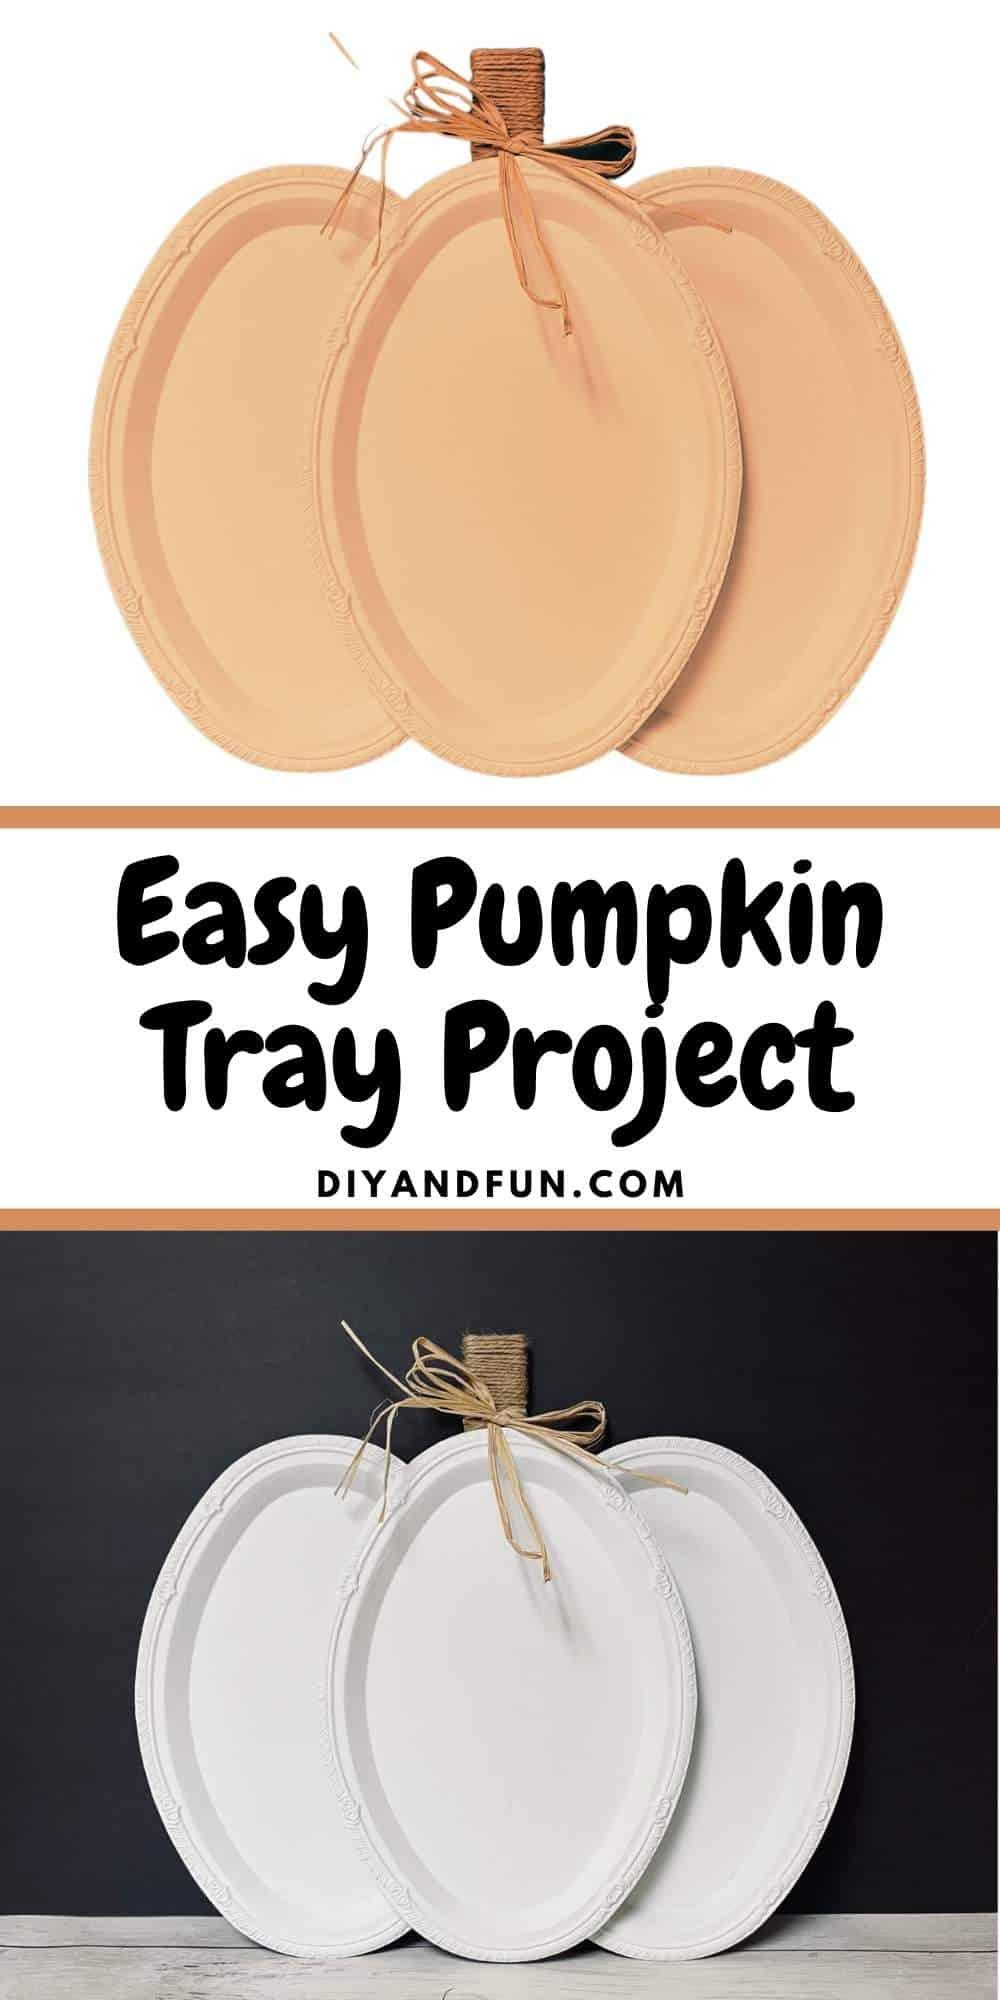 Easy Pumpkin Tray Project